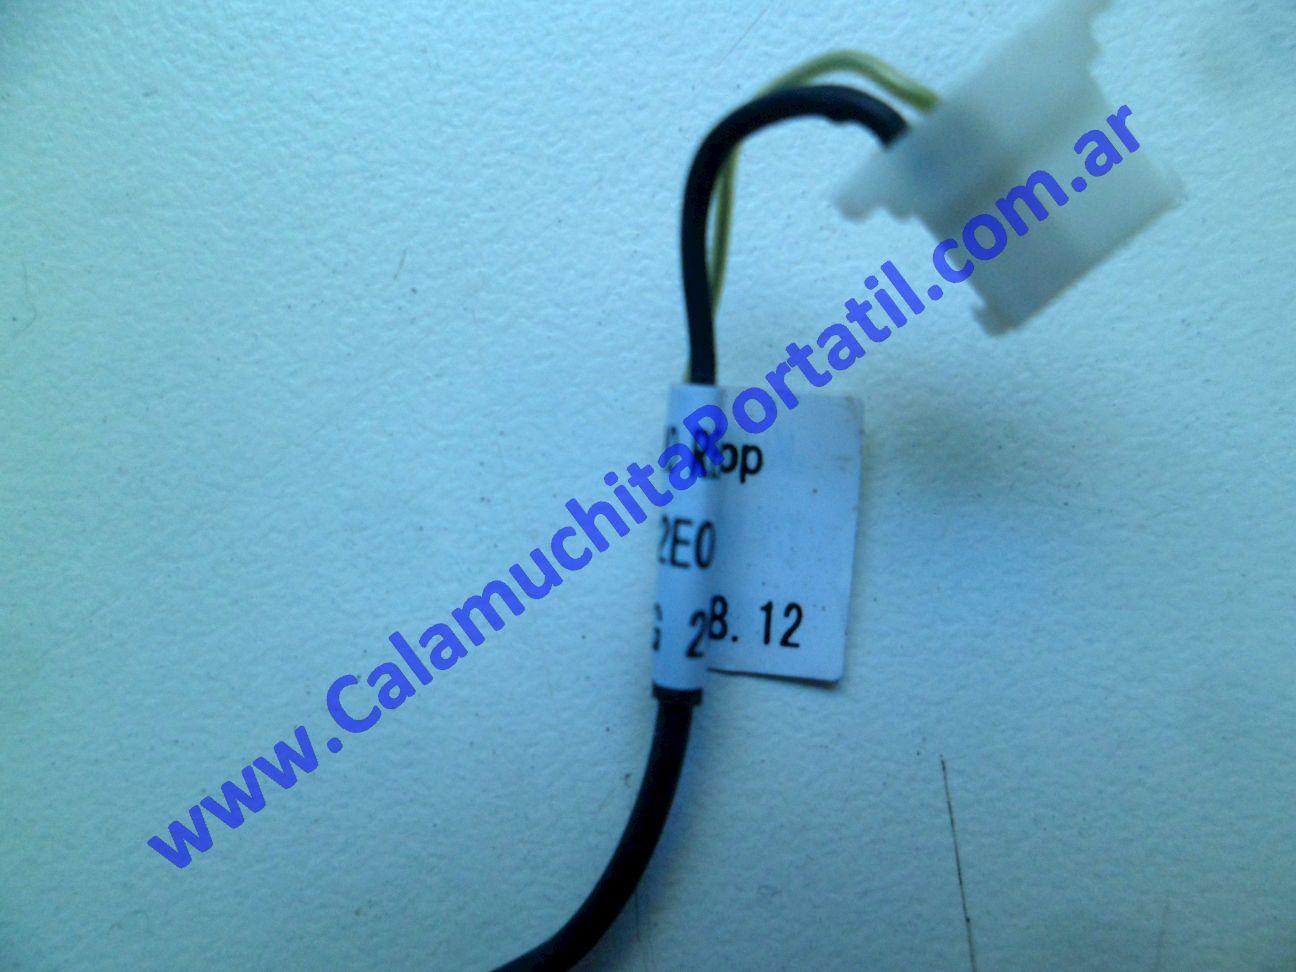 0564EMI Micrófono Compaq Presario CQ40-500LA / VD675LA#AC8